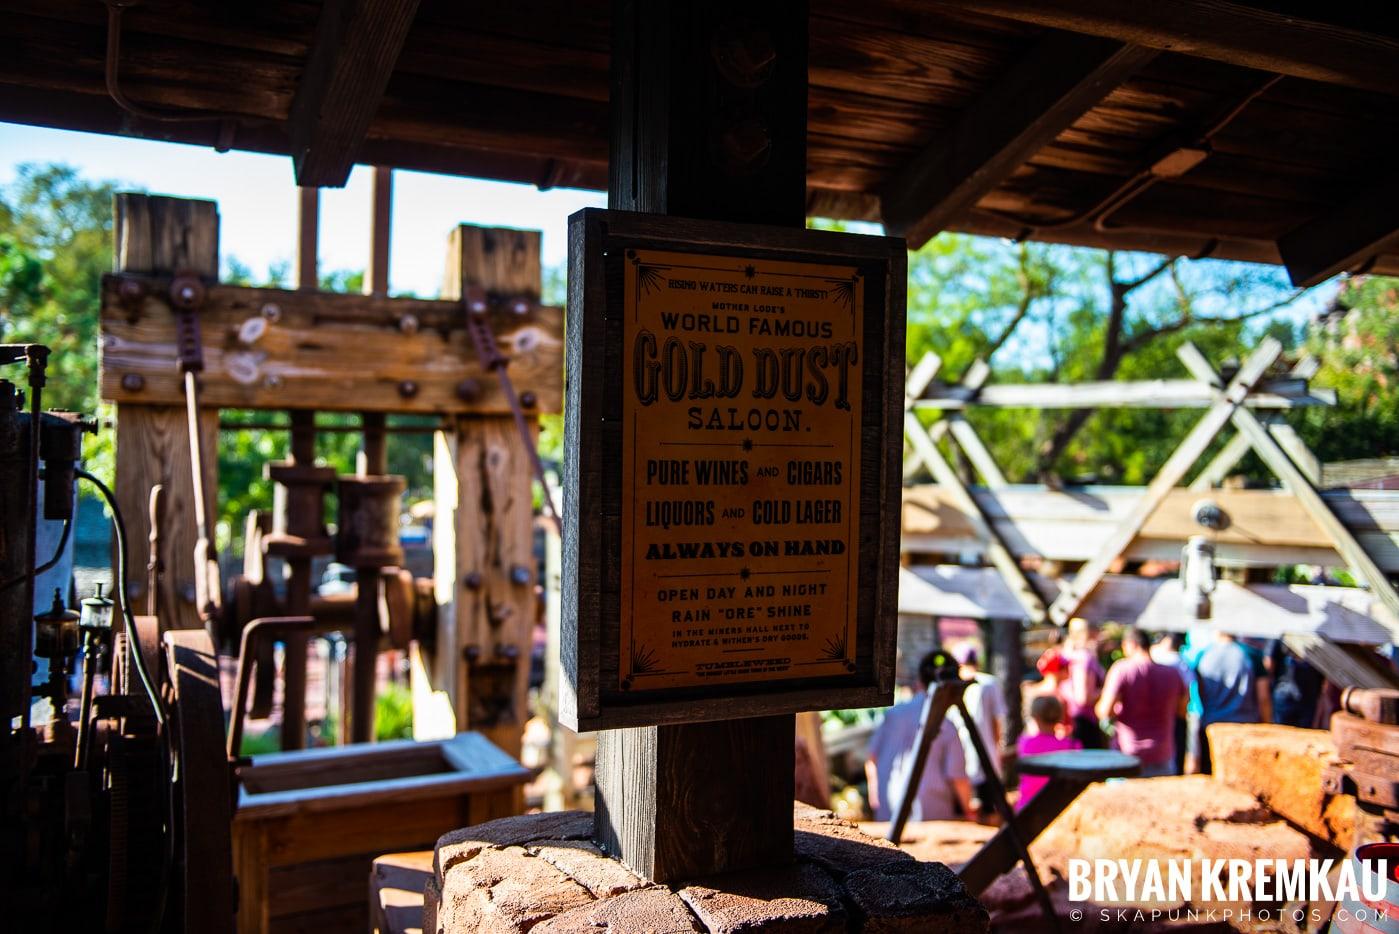 Walt Disney World Vacation: Day 6 (Magic Kingdom, Epcot, Disney's Hollywood Studios) - 10.4.19 (32)